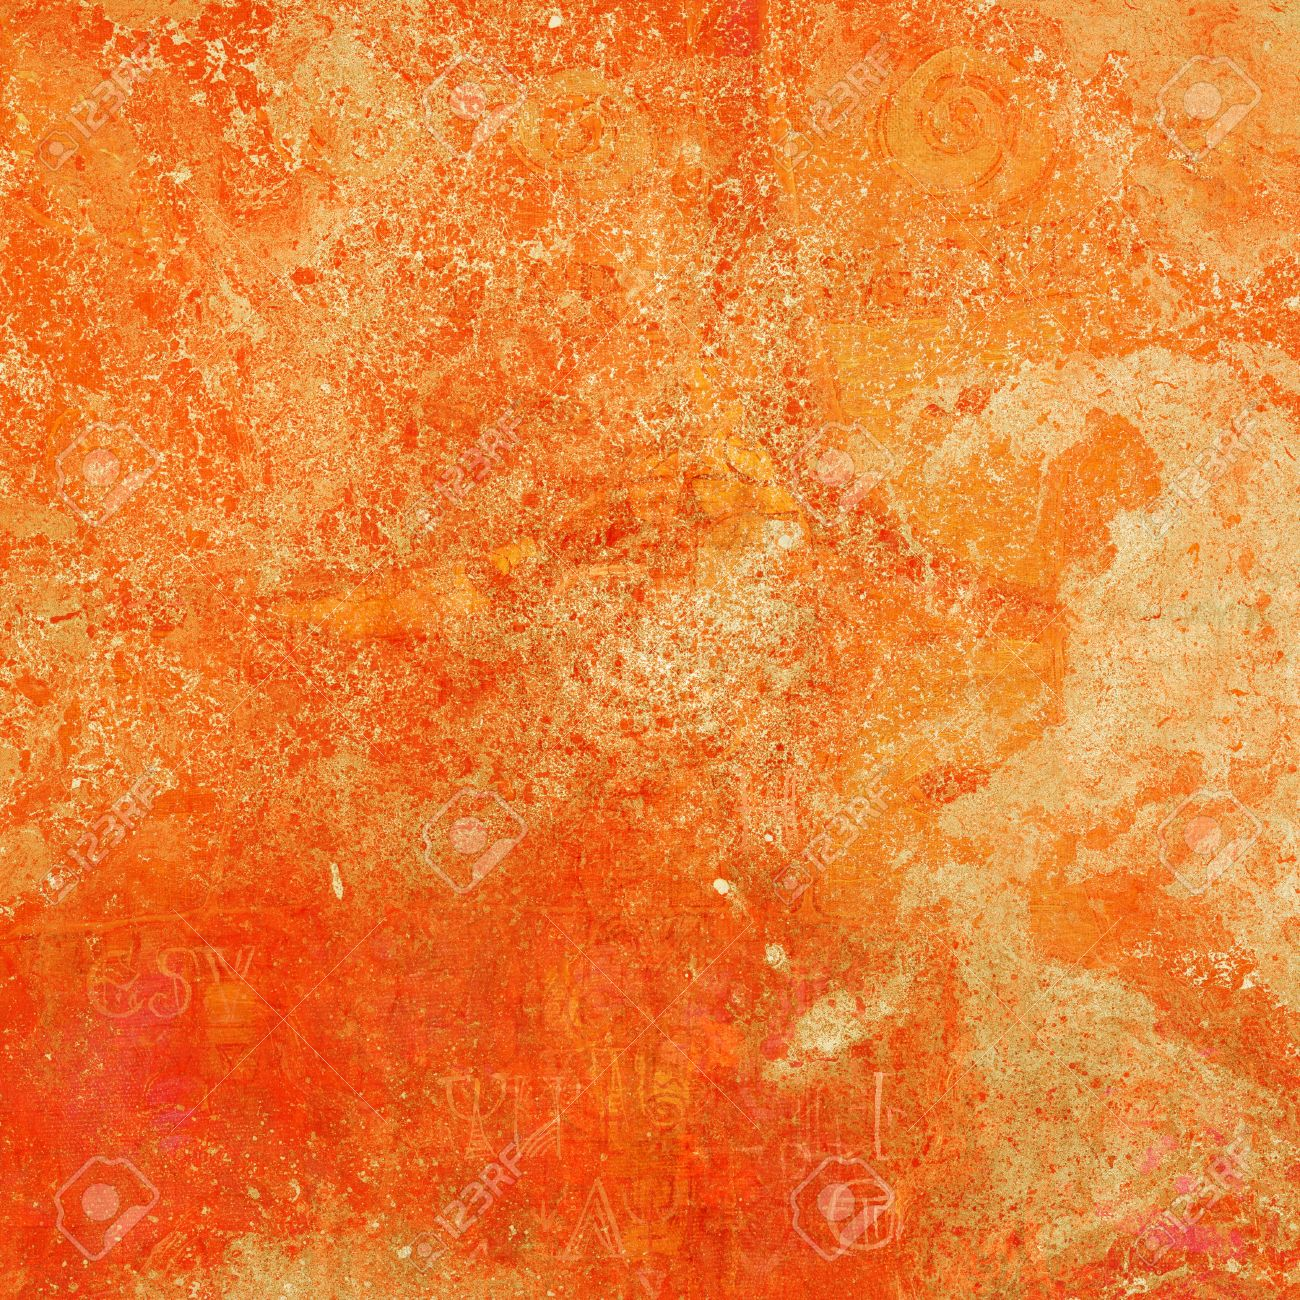 bright orange vintage background for creative artworks stock photo